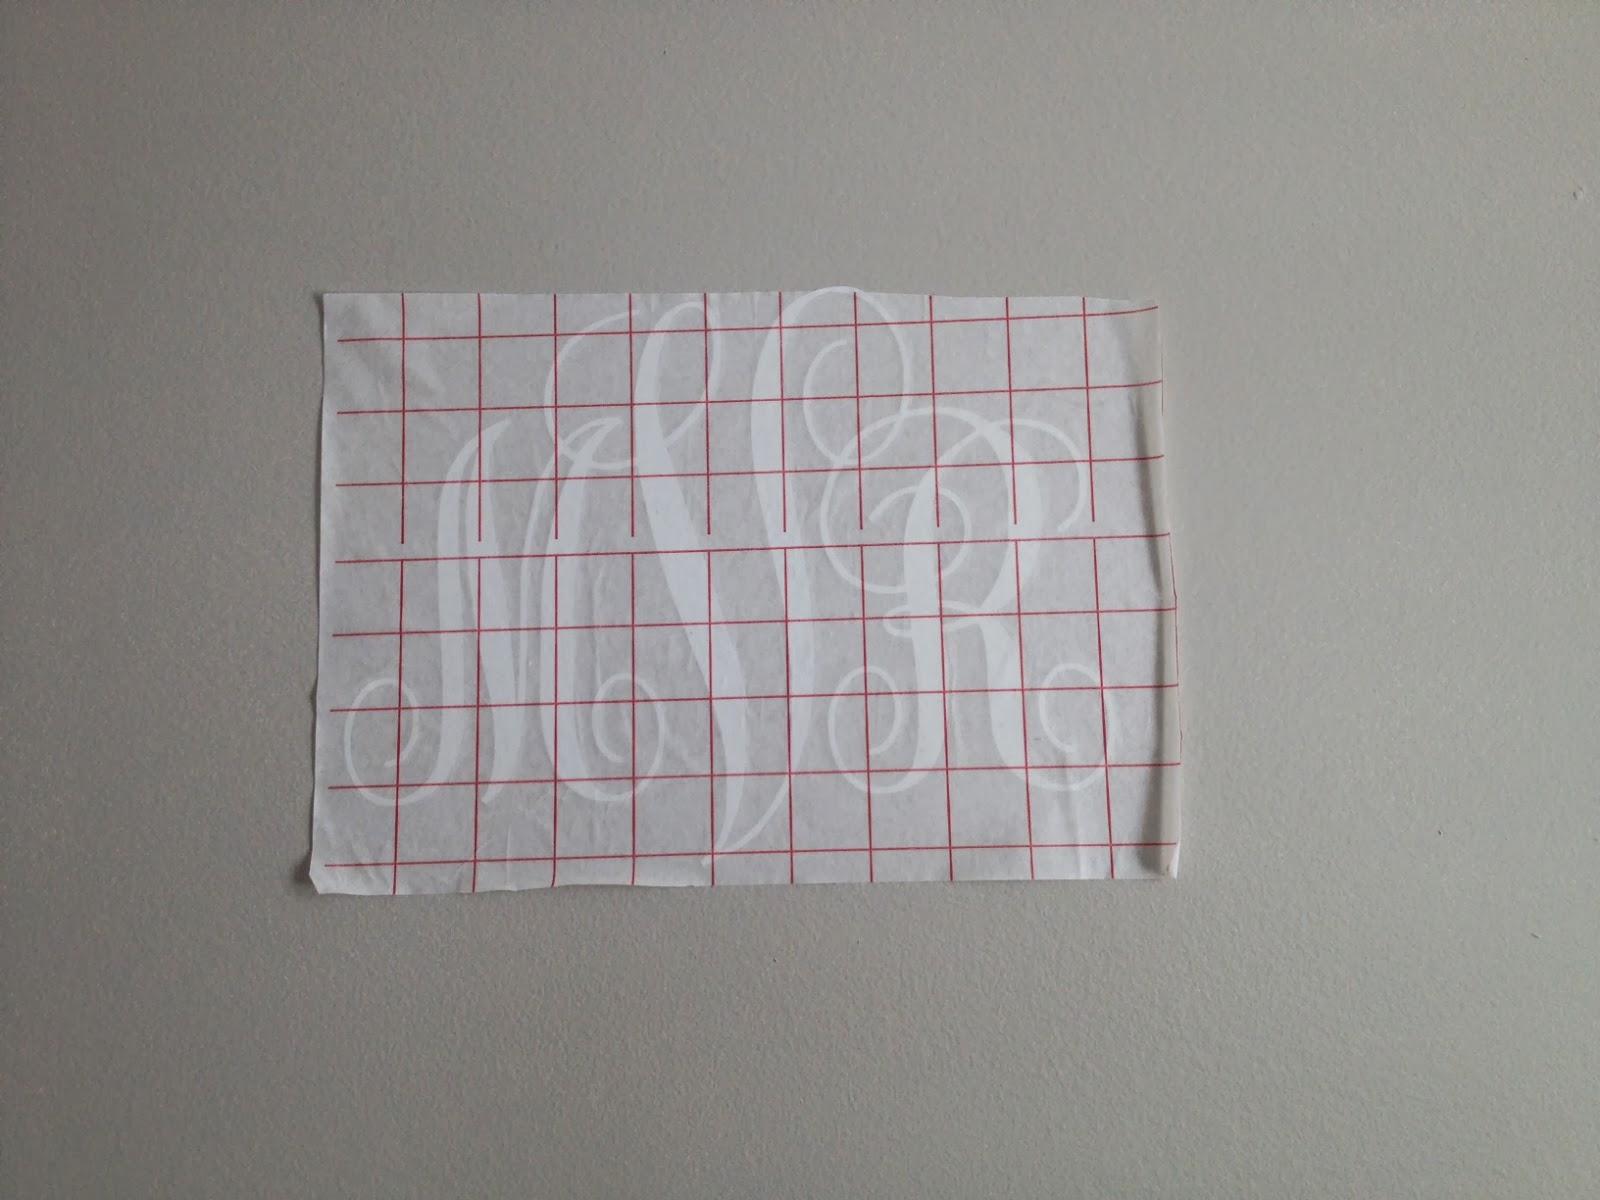 Vinyl, monogram, wall art, Silhouette tutorial, Silhouette Studio, transfer paper